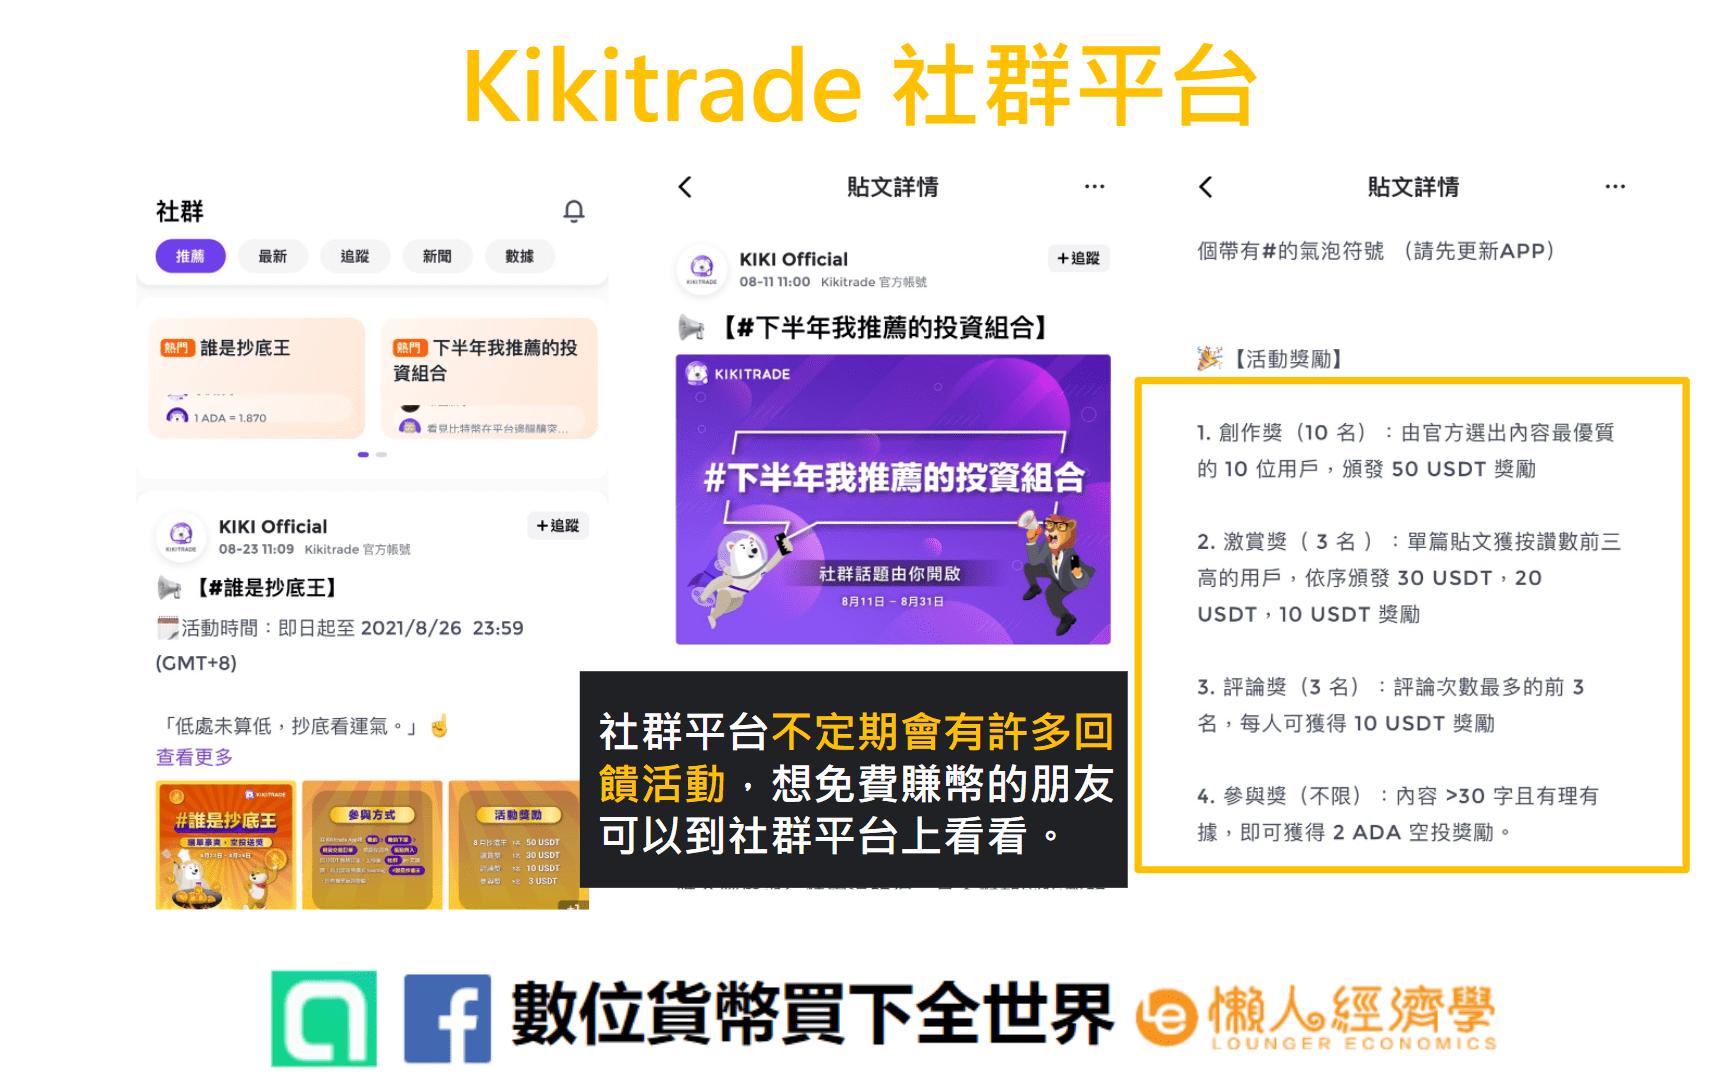 Kikitrade 社群平台